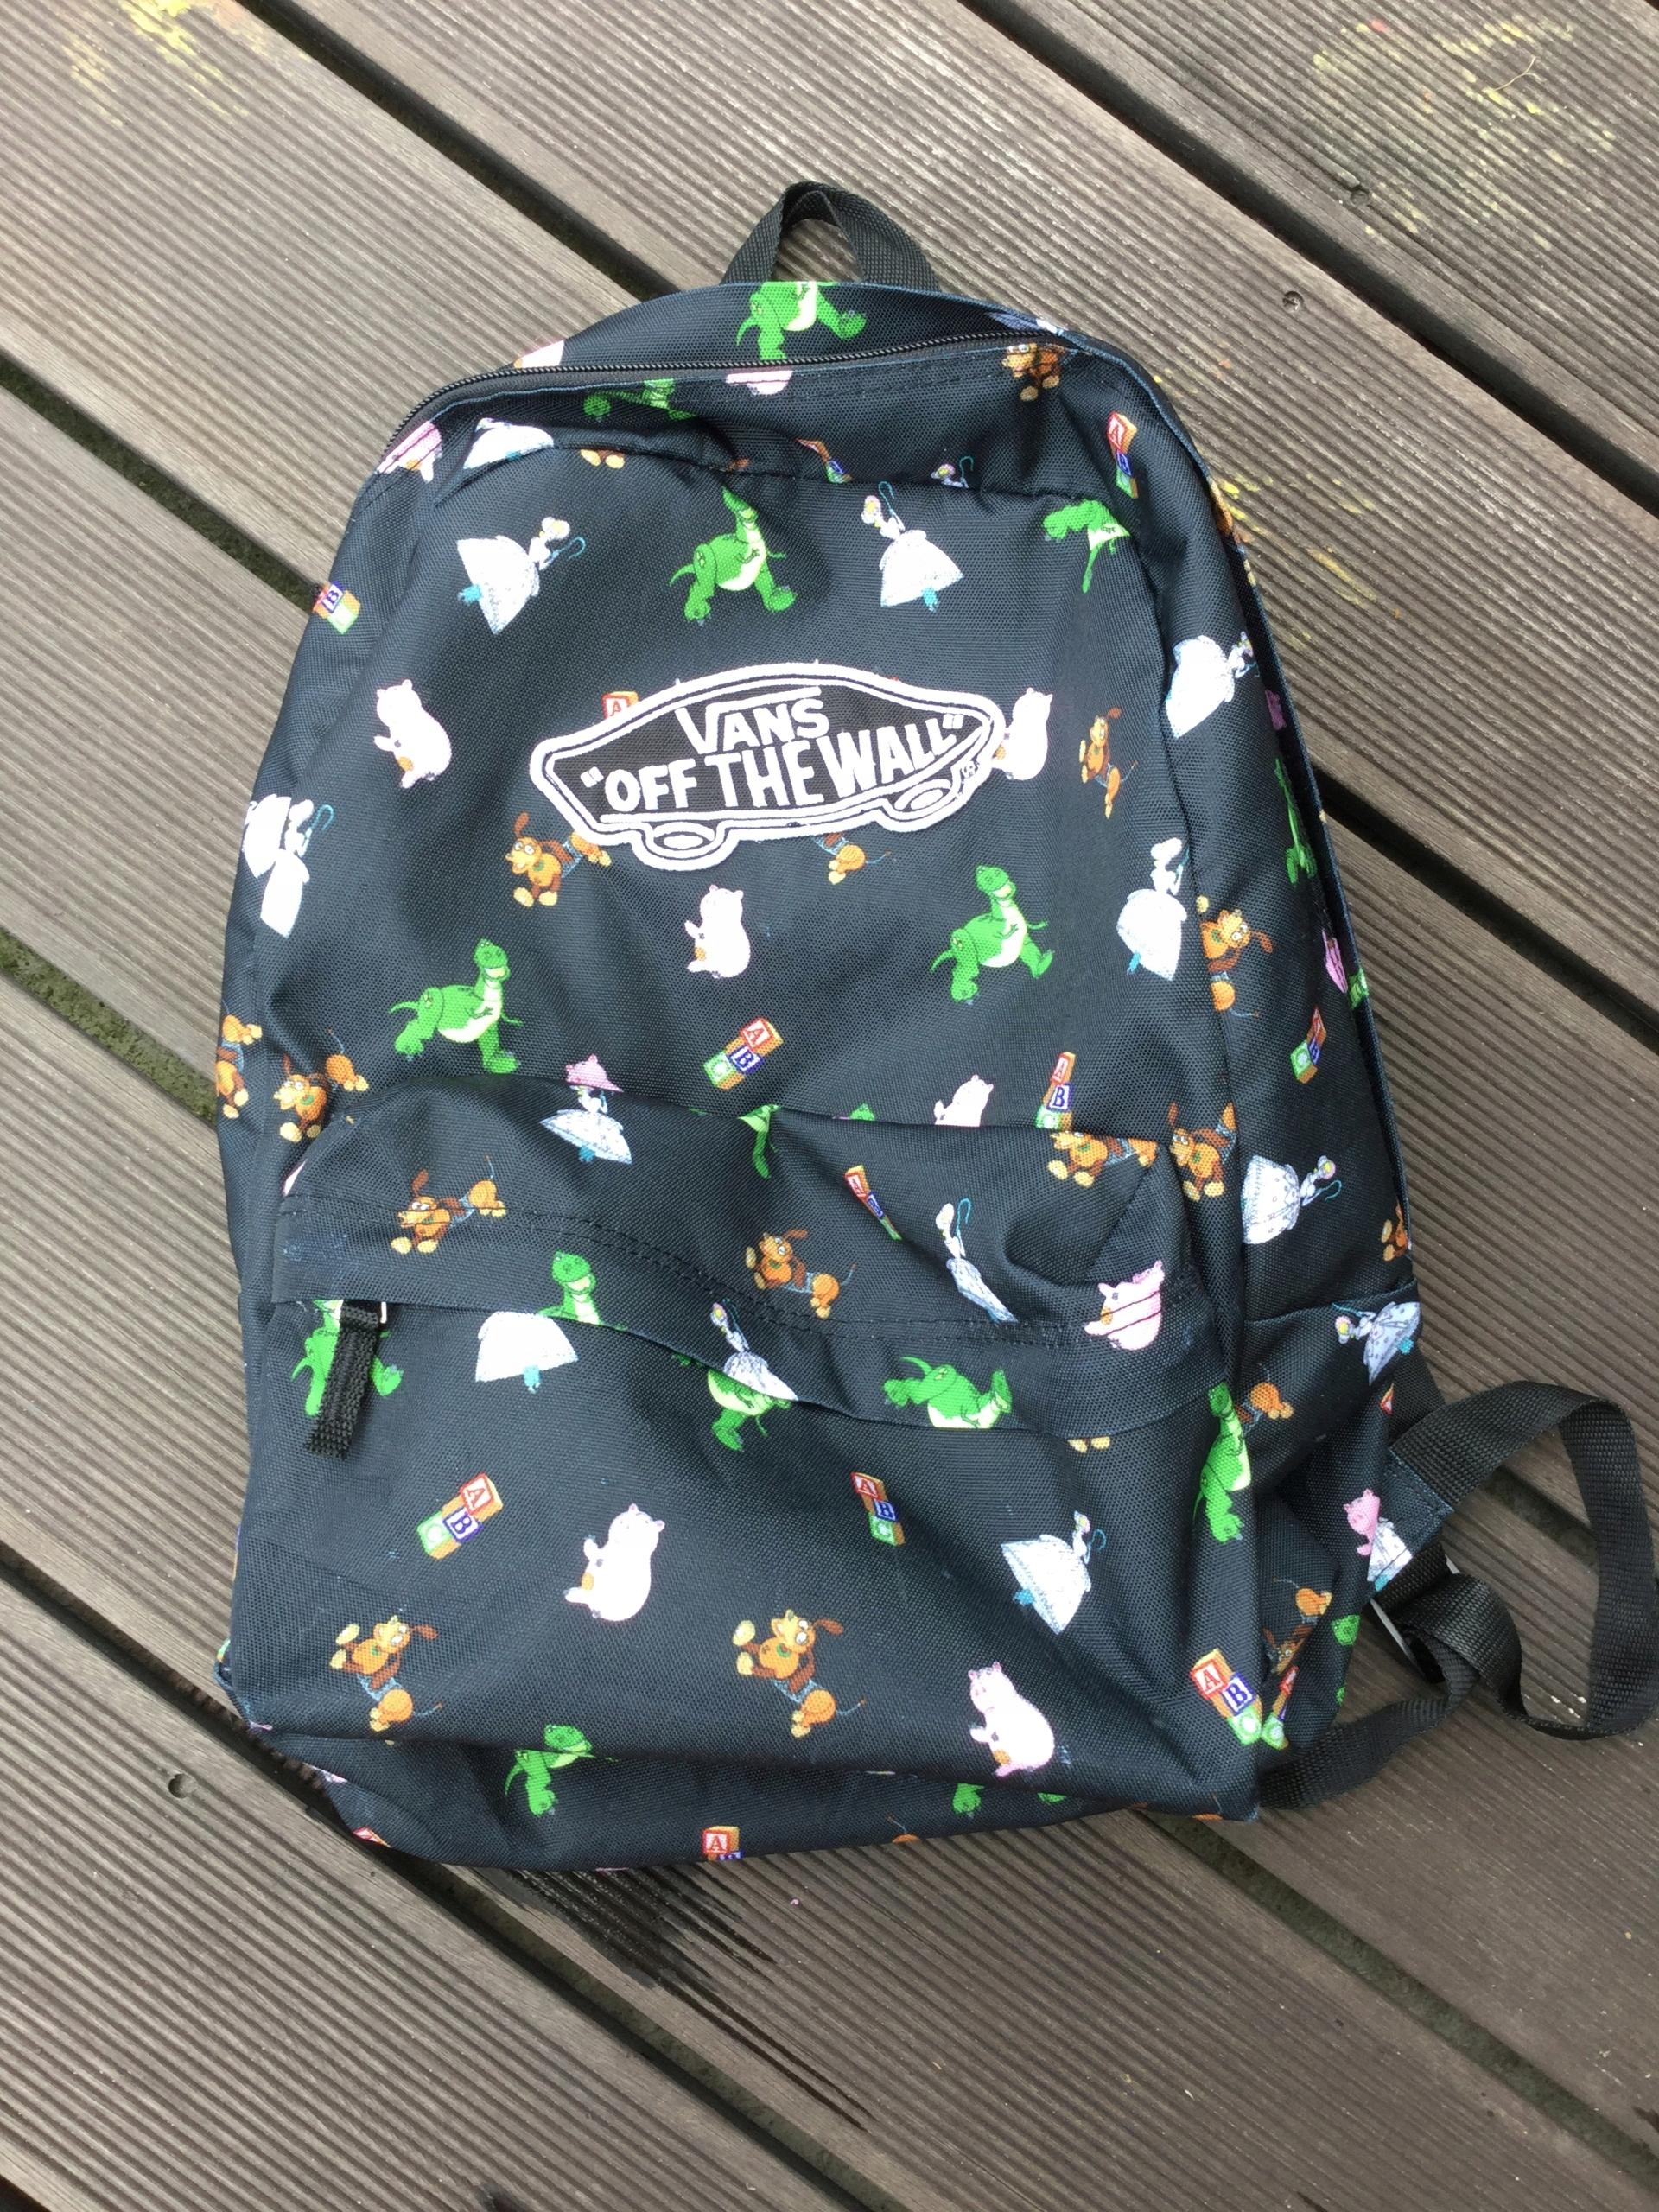 2d80e7cc94422 Plecak VANS z motywem z bajki Toy story - 7511387200 - oficjalne ...